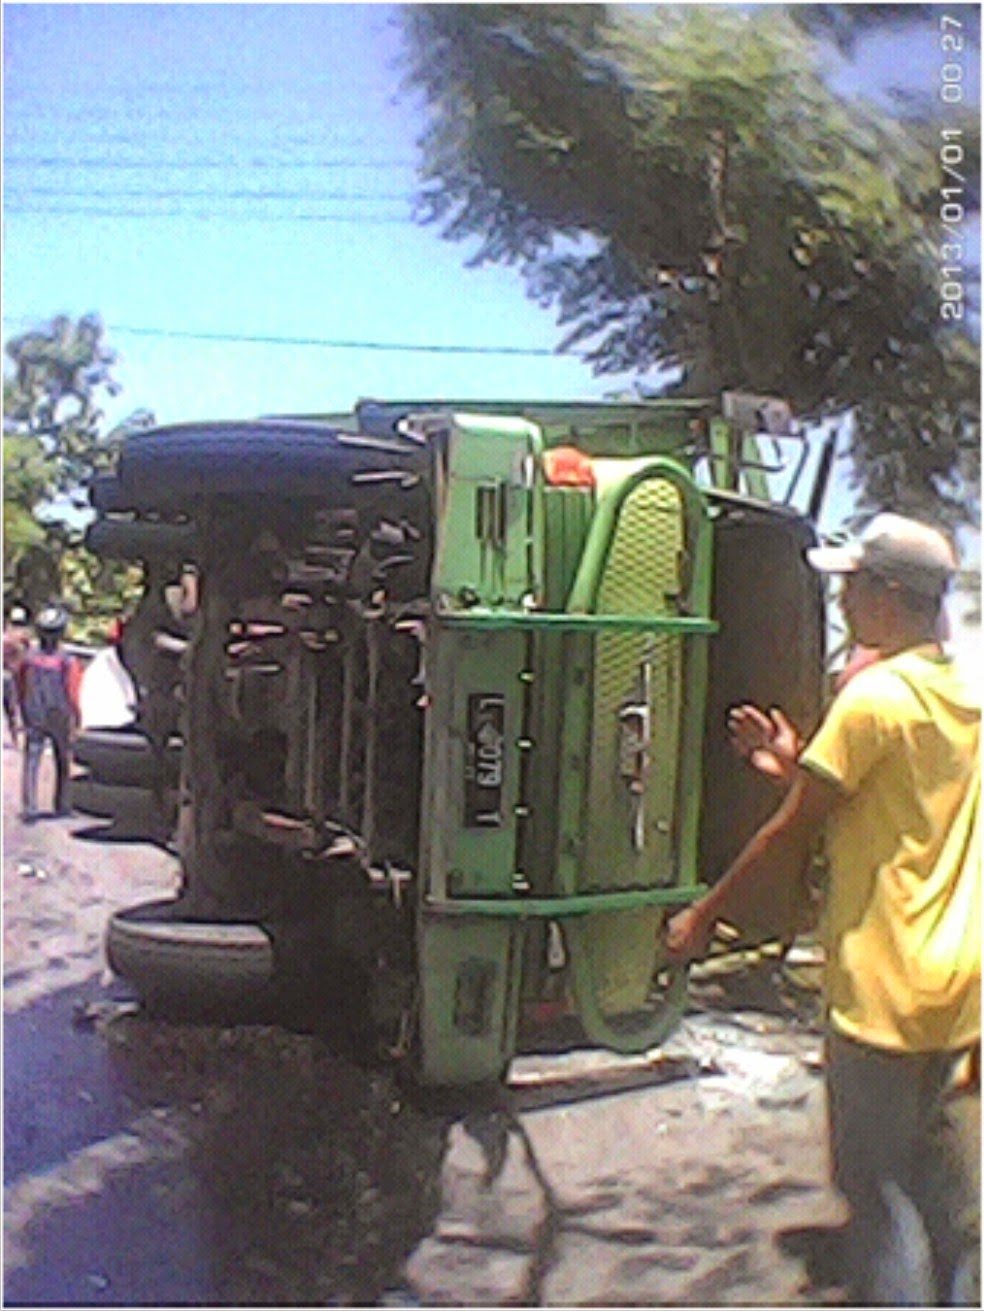 Truk Tujuan Surabaya-Ende Terbalik di Jalan Lintas Wawo